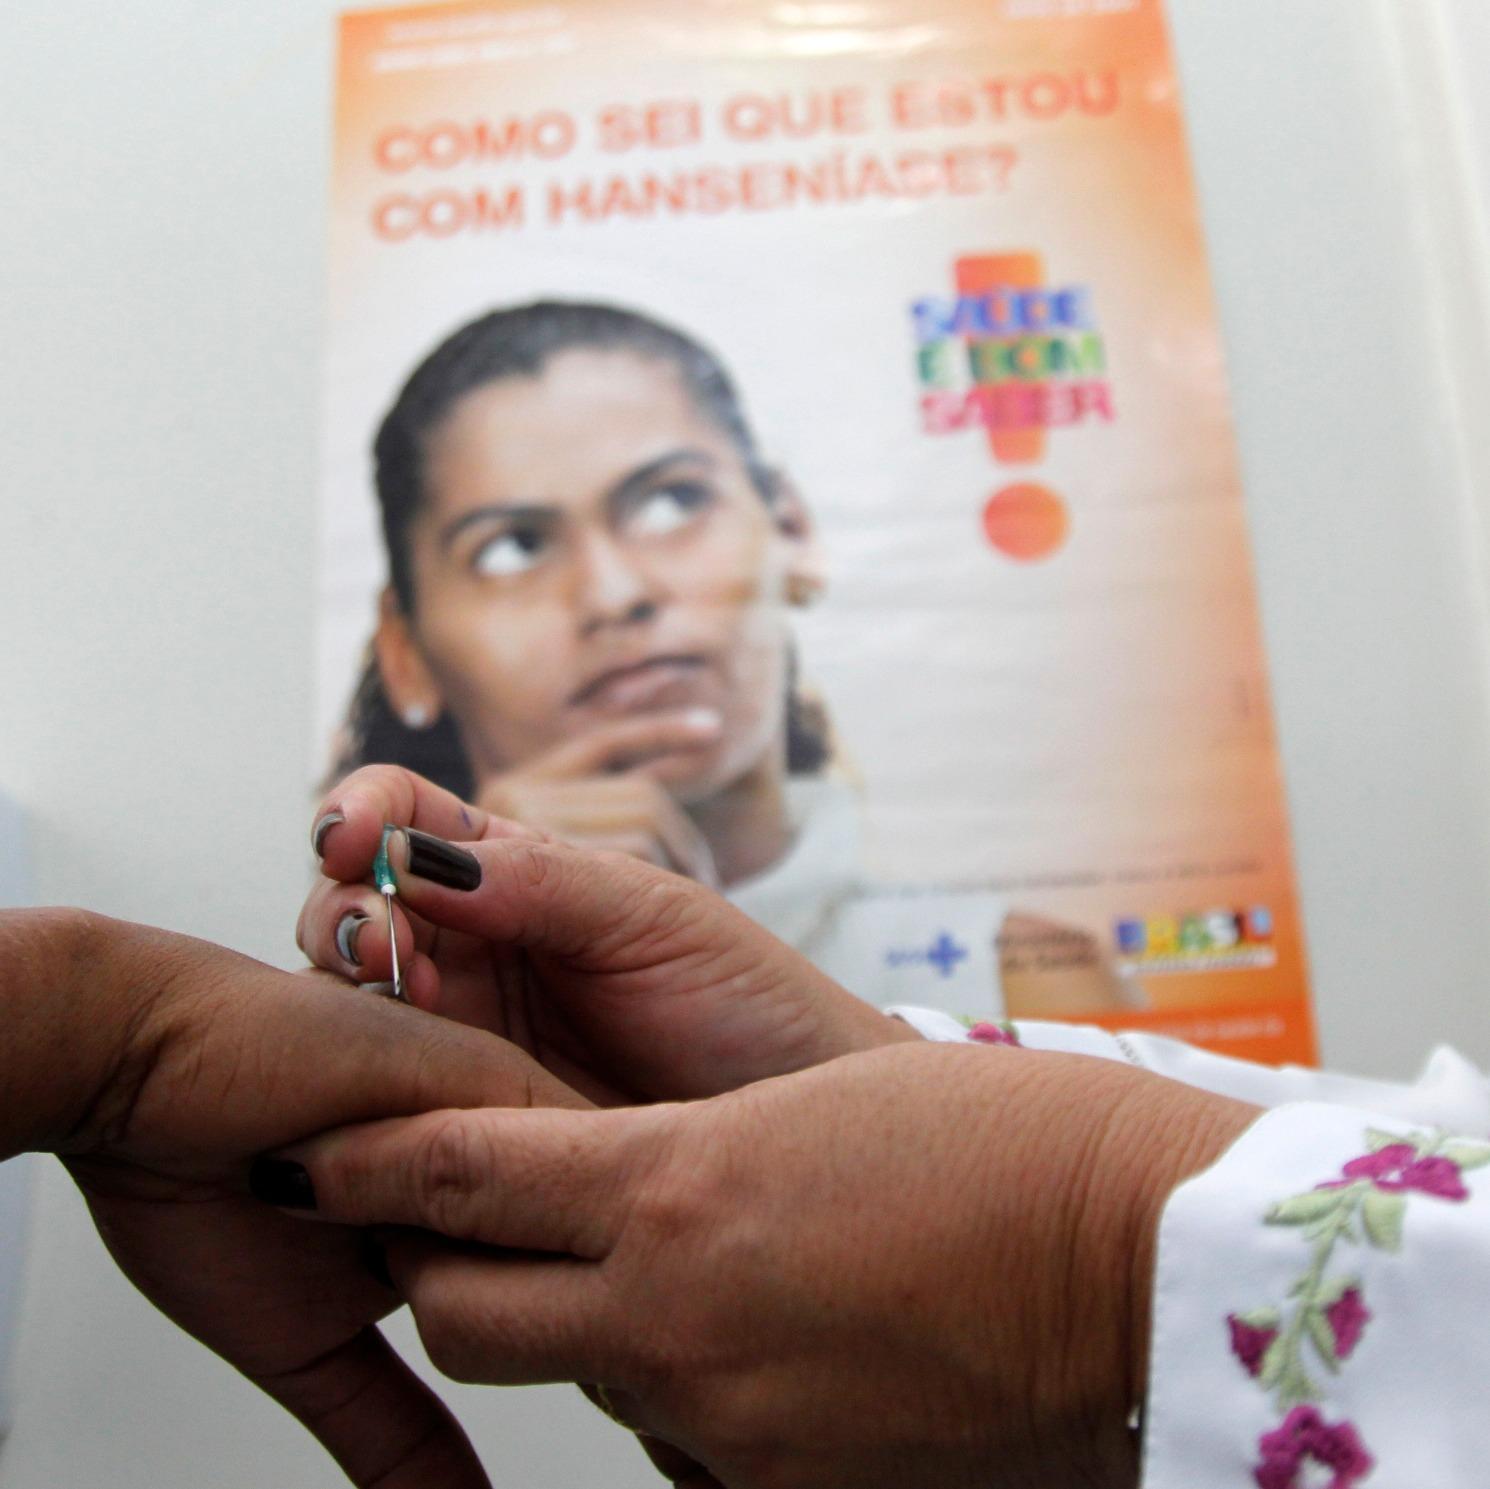 Pará registrou mais de dois mil casos de hanseníase em 2018